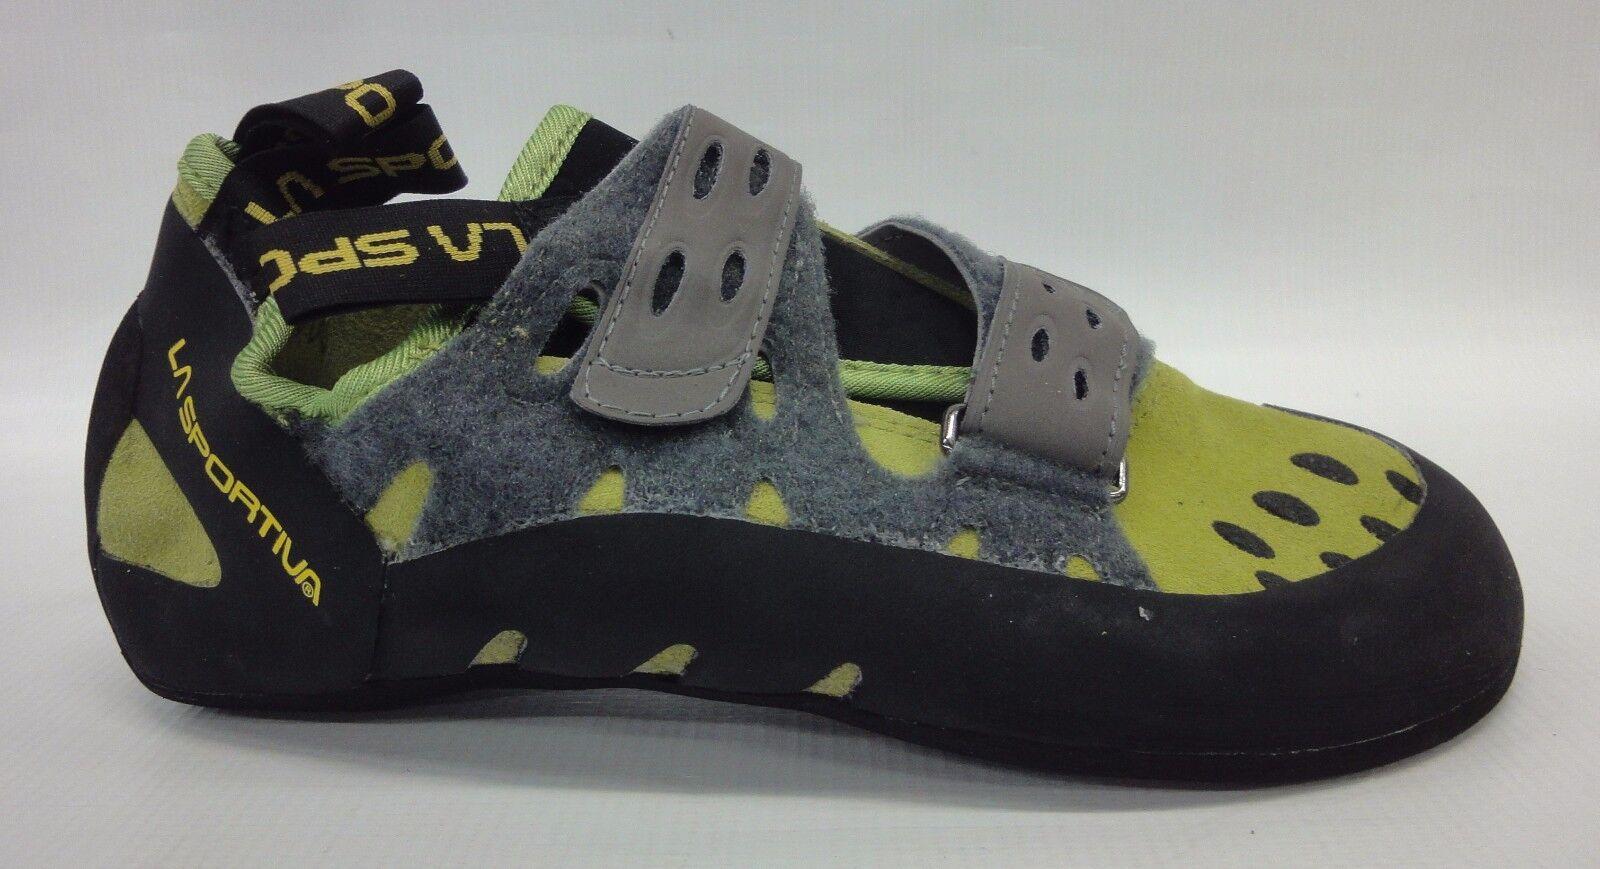 La Sportiva Mens Tarantula Climbing shoes 10C Kiwi Grey Size 46